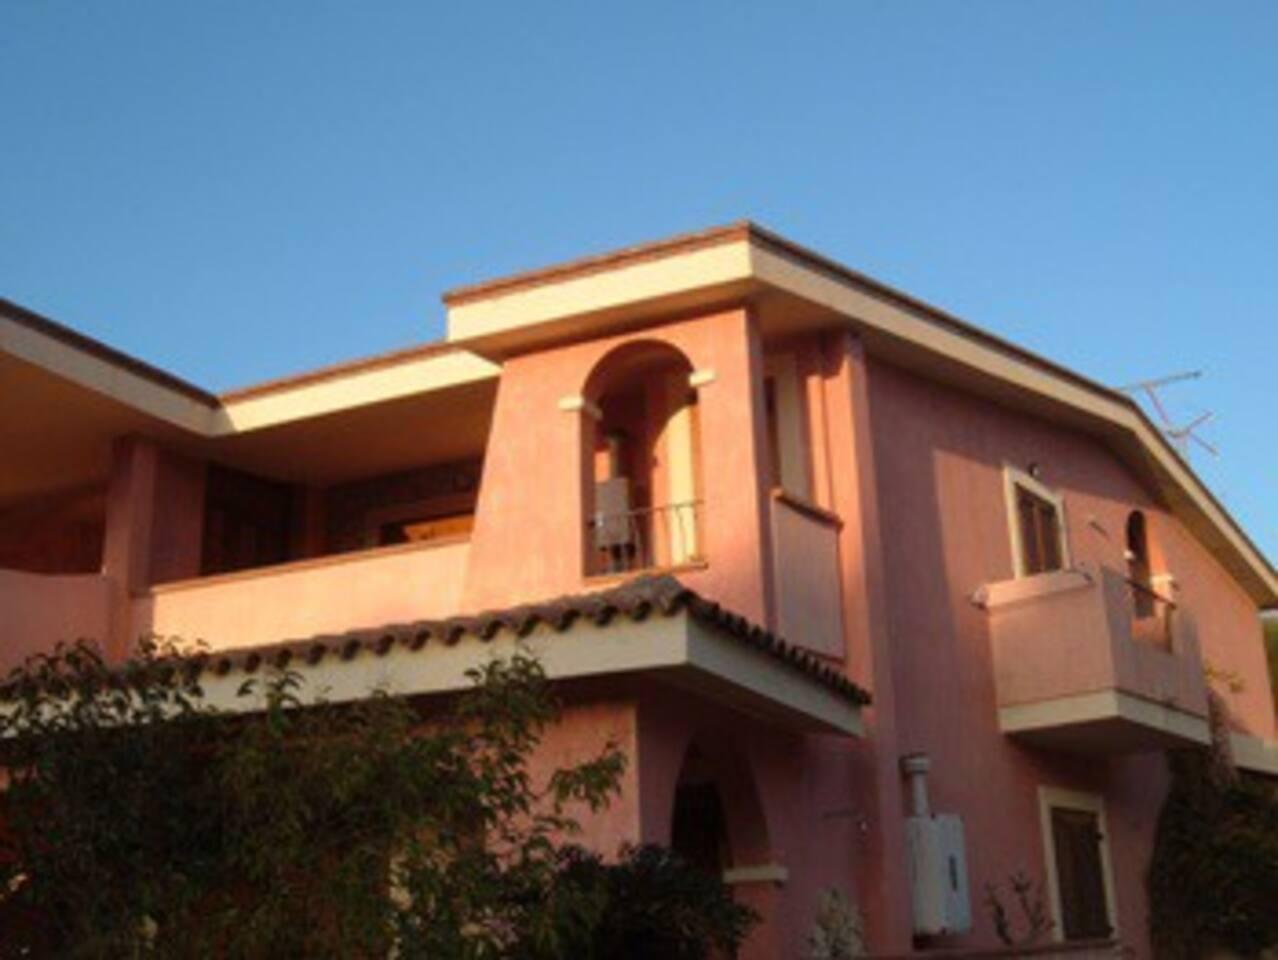 vista esterna della casa